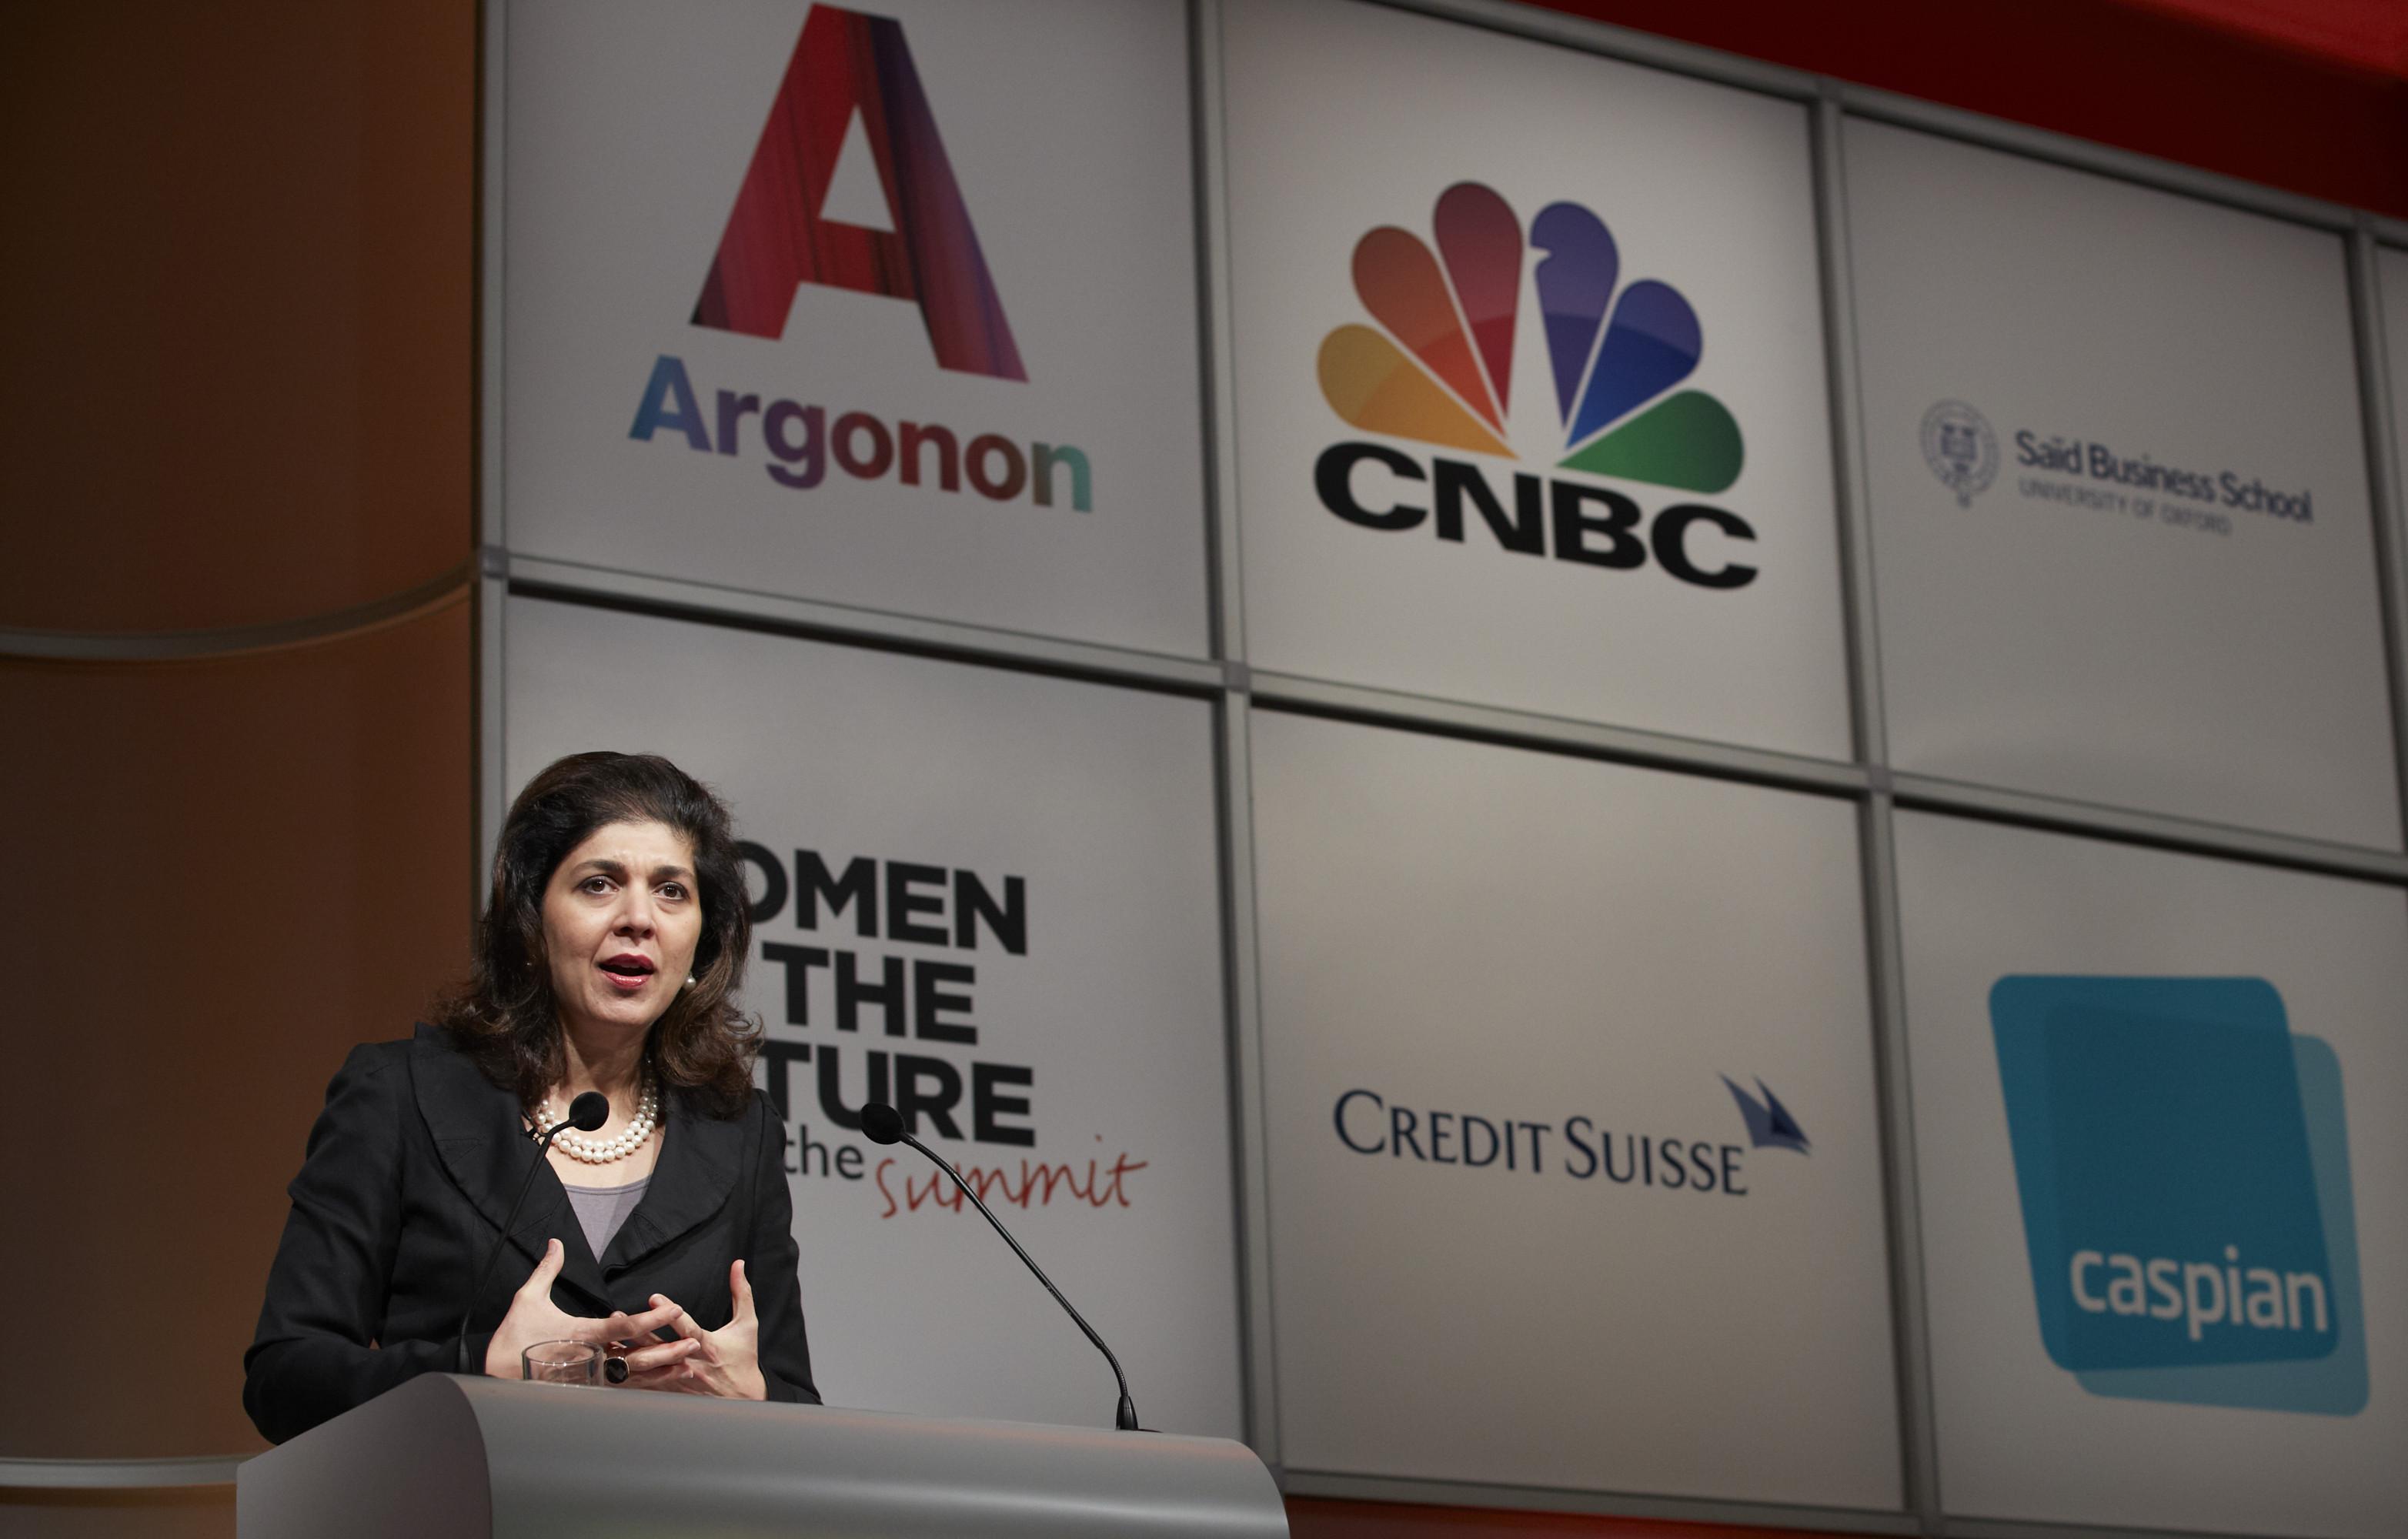 Farah Pandith: Entrepreneurship is evolving